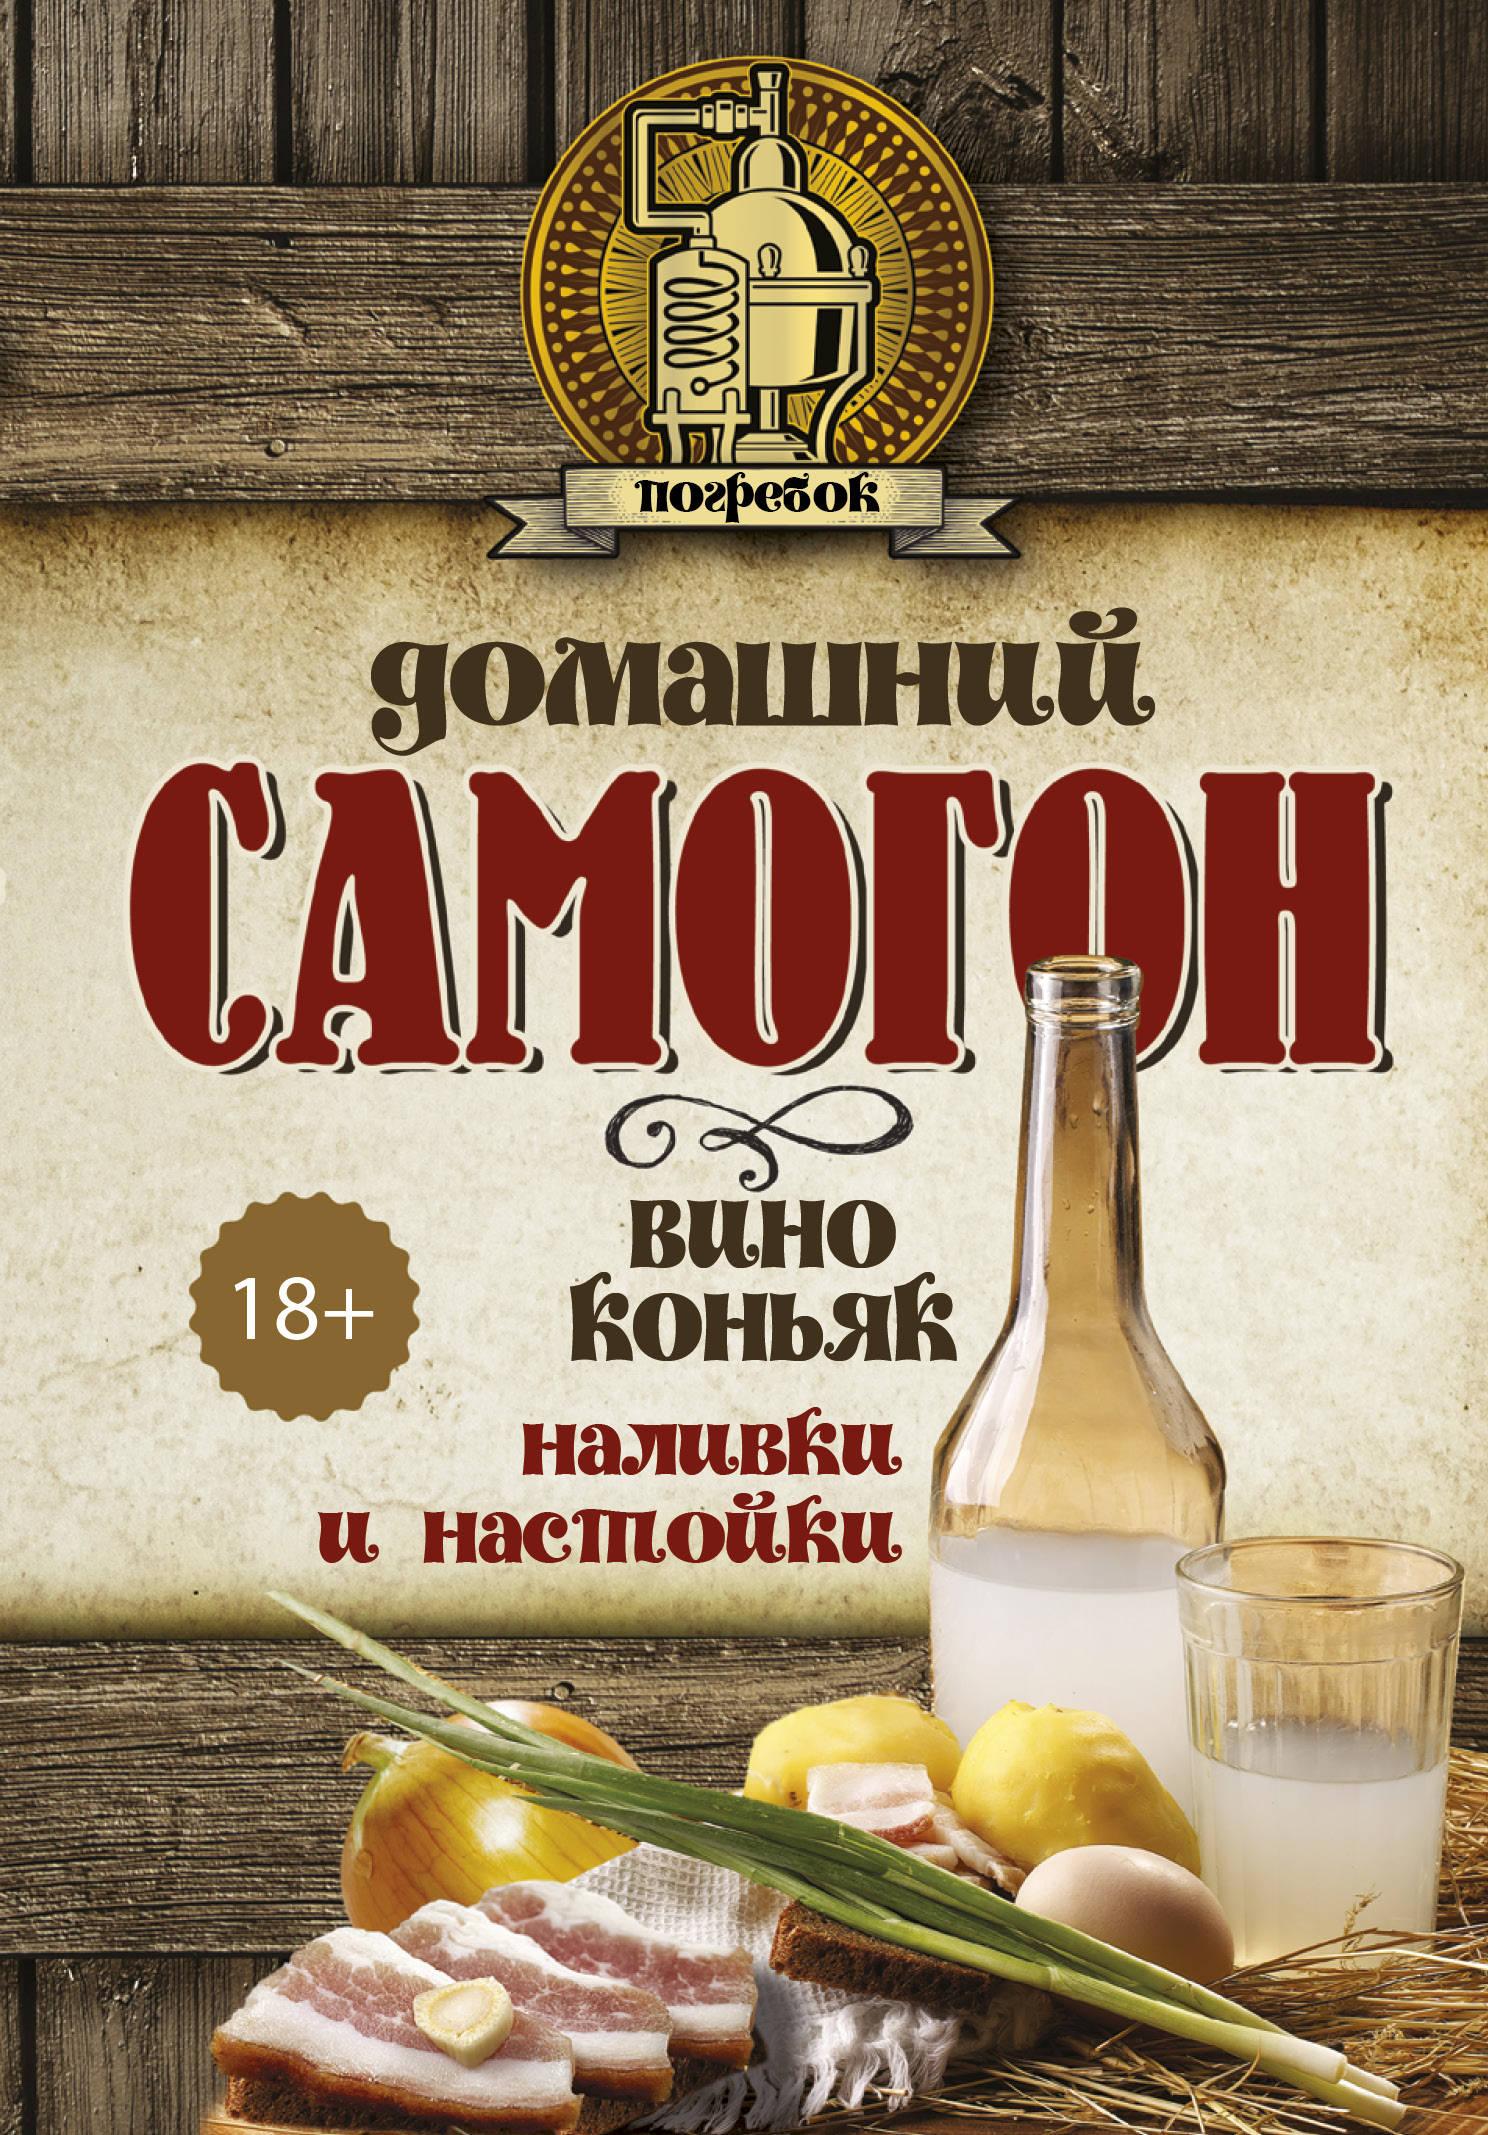 цена на Токарев Дмитрий Николаевич Домашний самогон, вино, коньяк, наливки и настойки